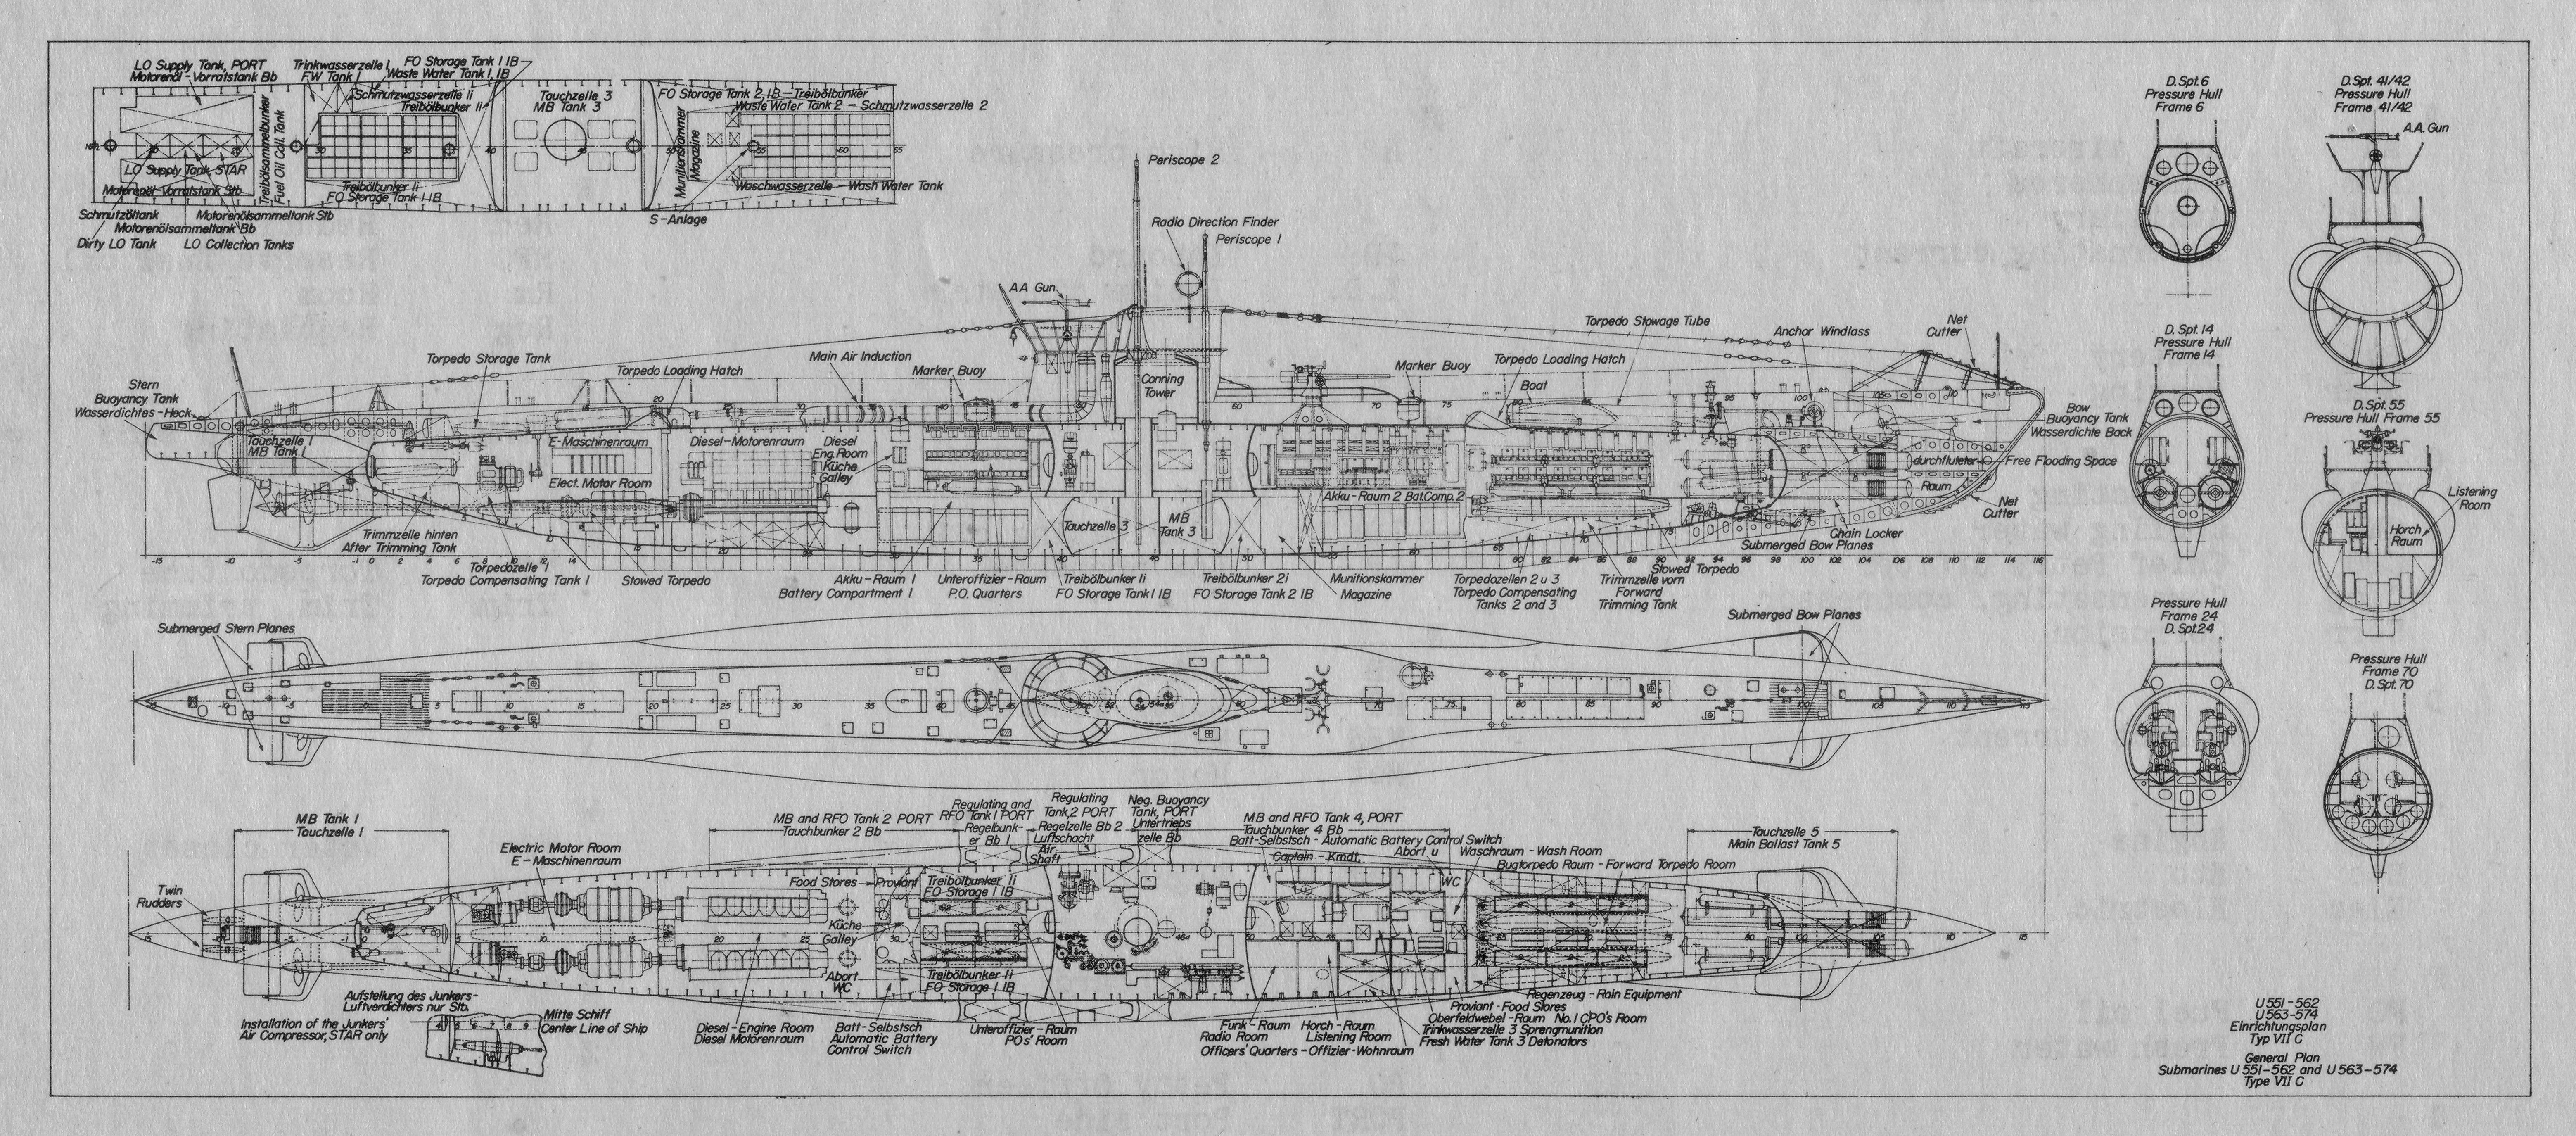 file:type viic u-boat schematic drawing jpg